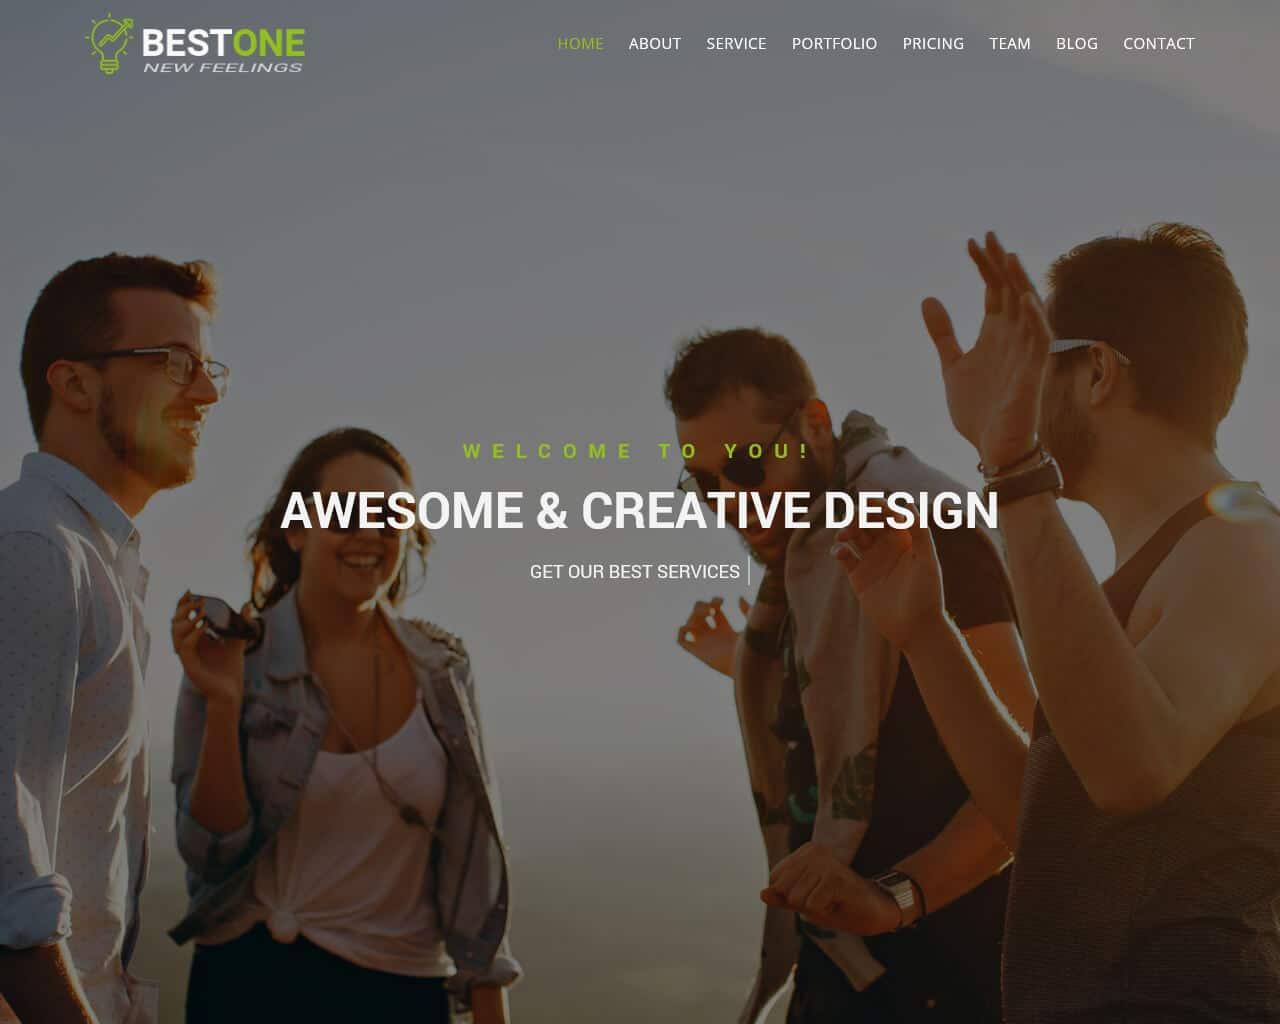 Bestone Website Template